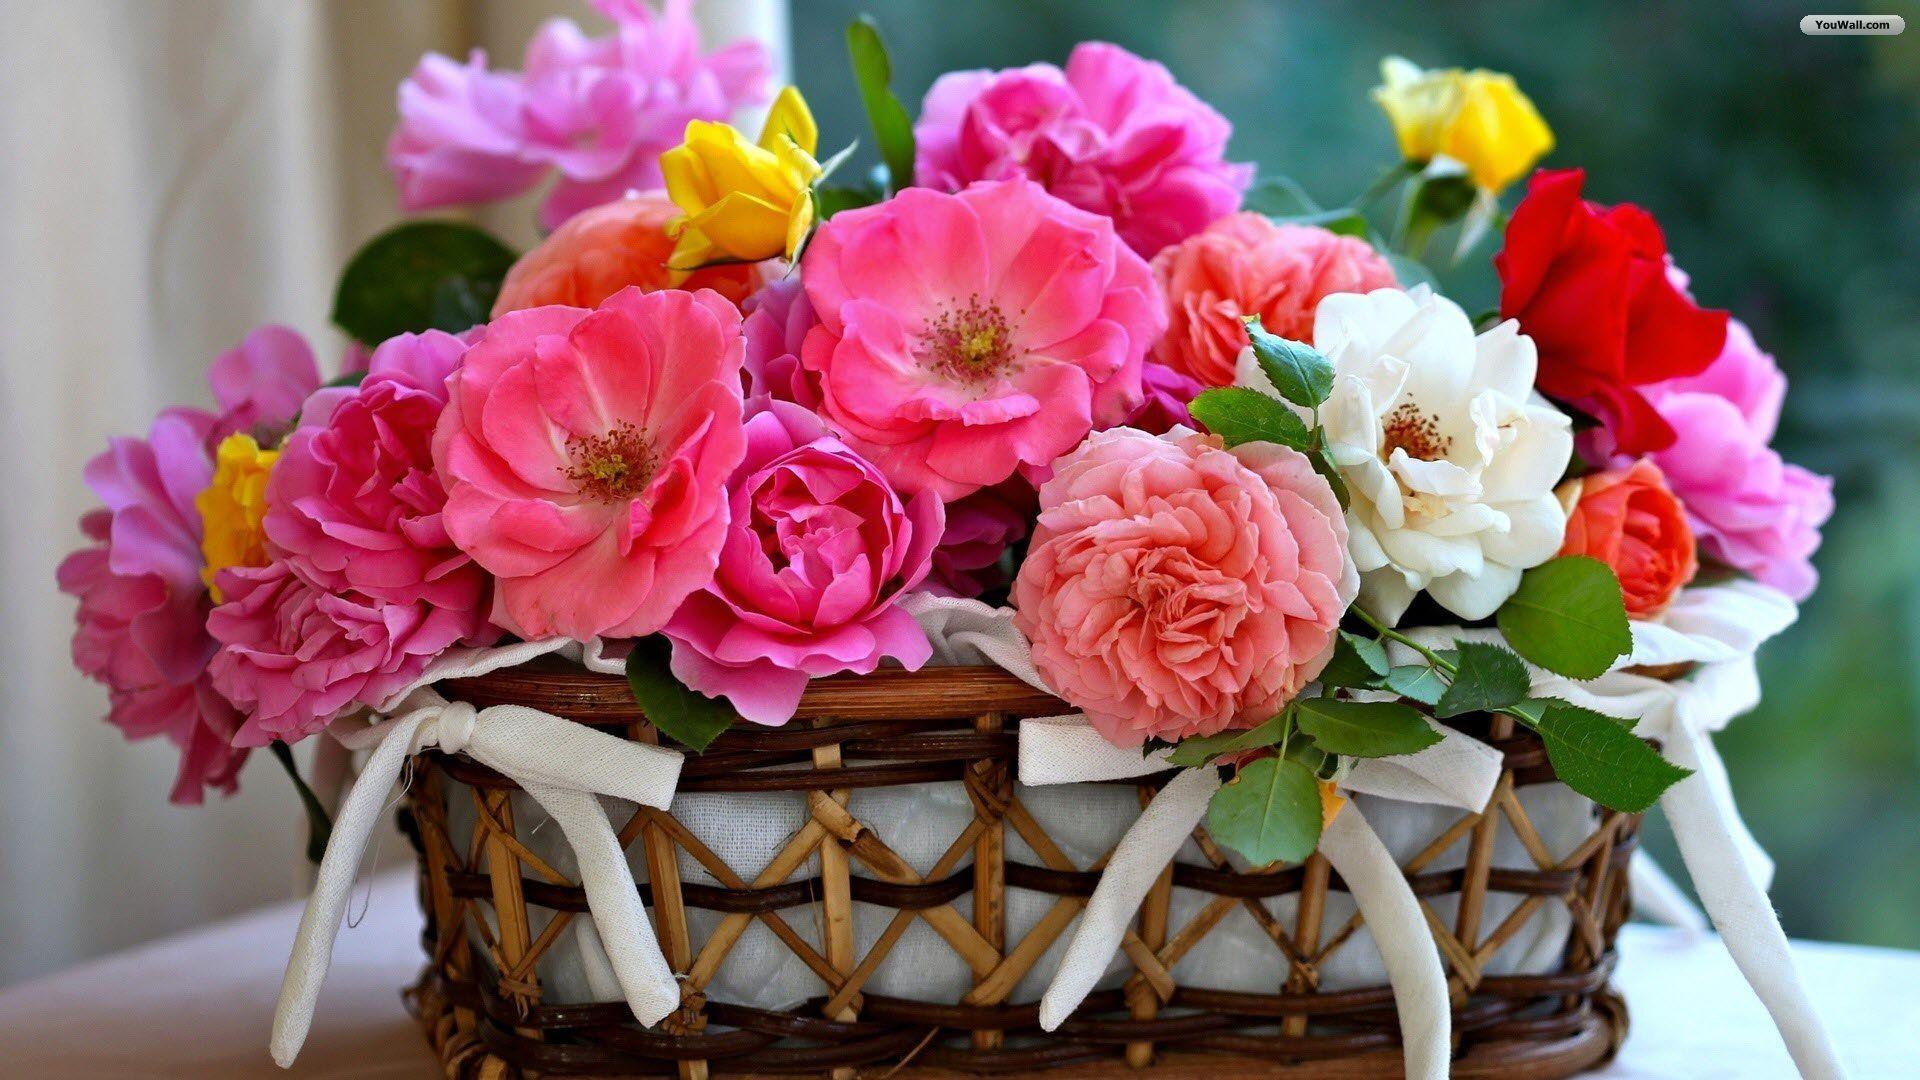 Permalink to Elegant Flowers Bouquet Wallpaper